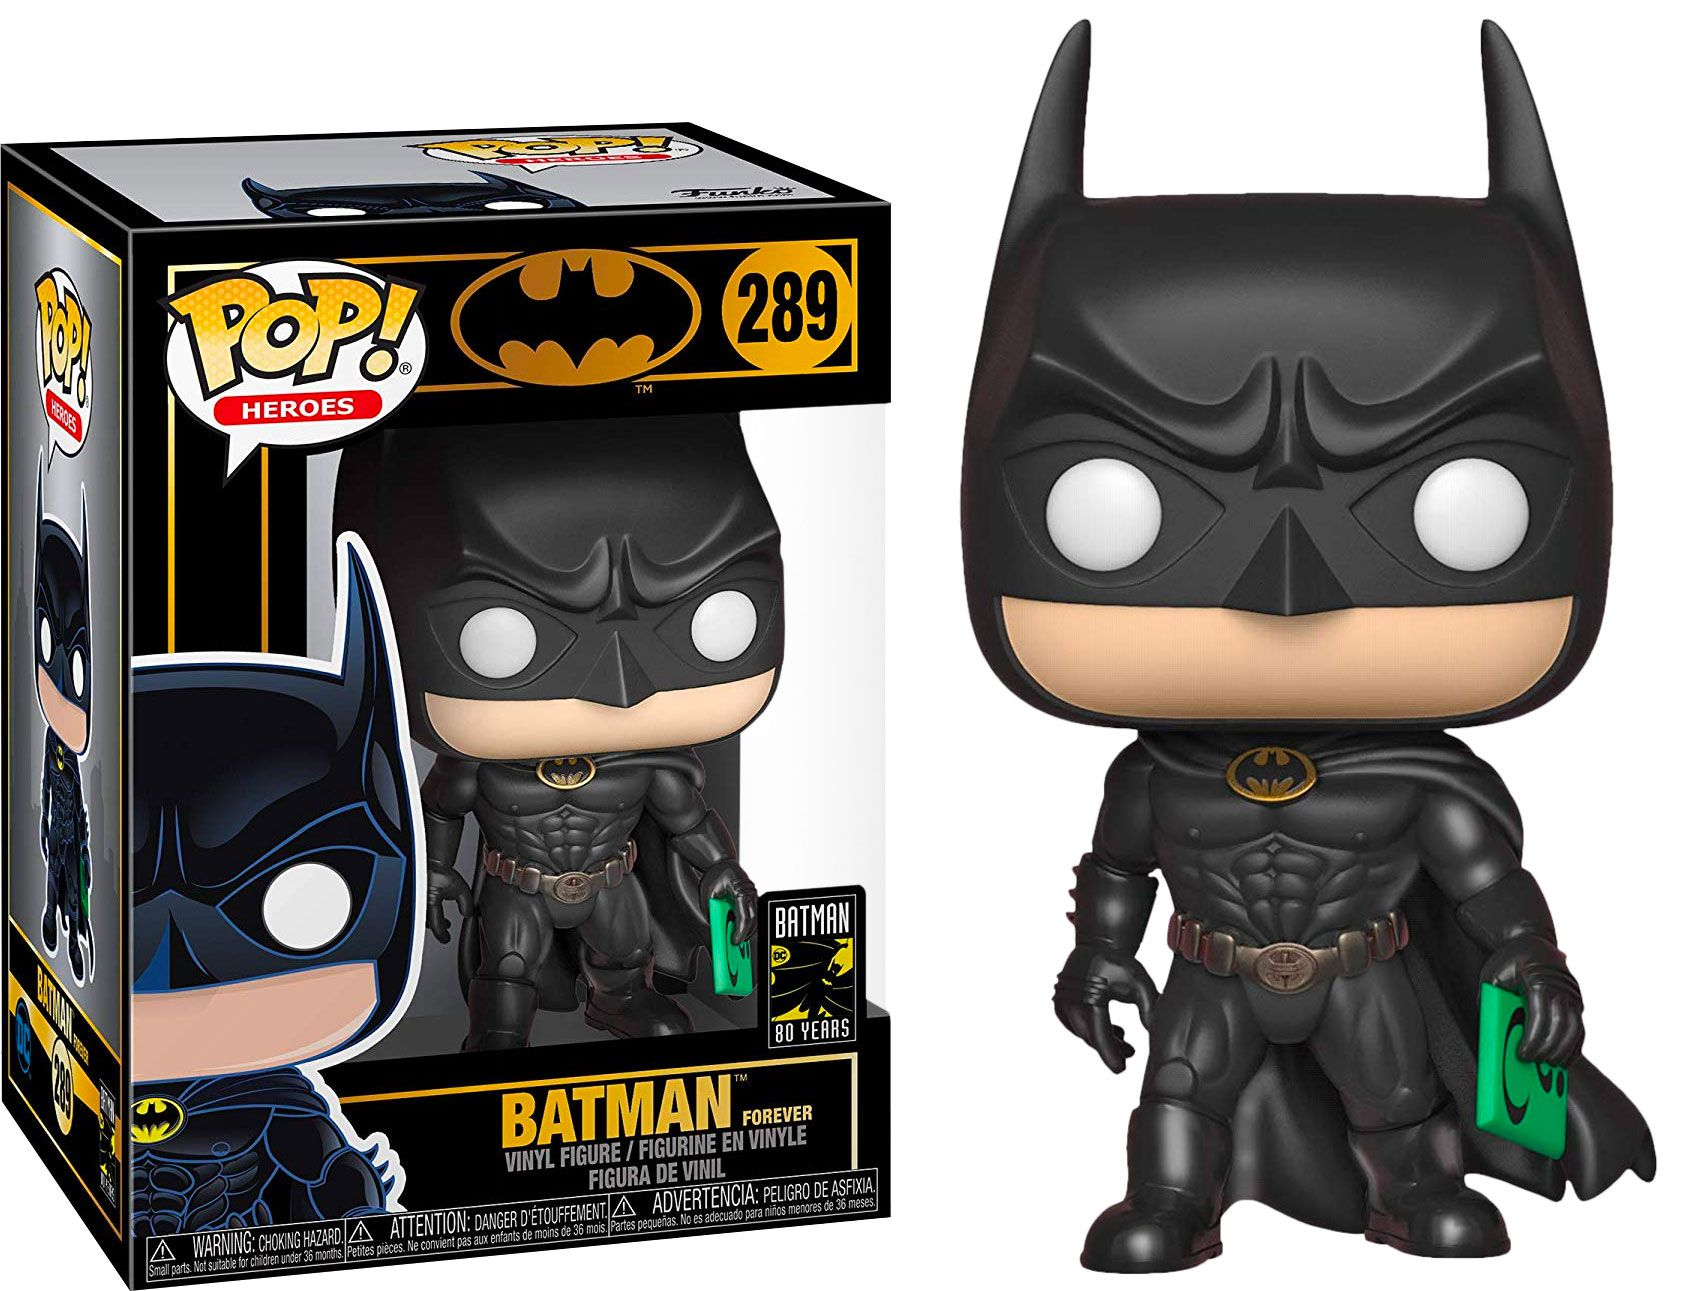 Batman Forever #289 - Funko Pop! Heroes